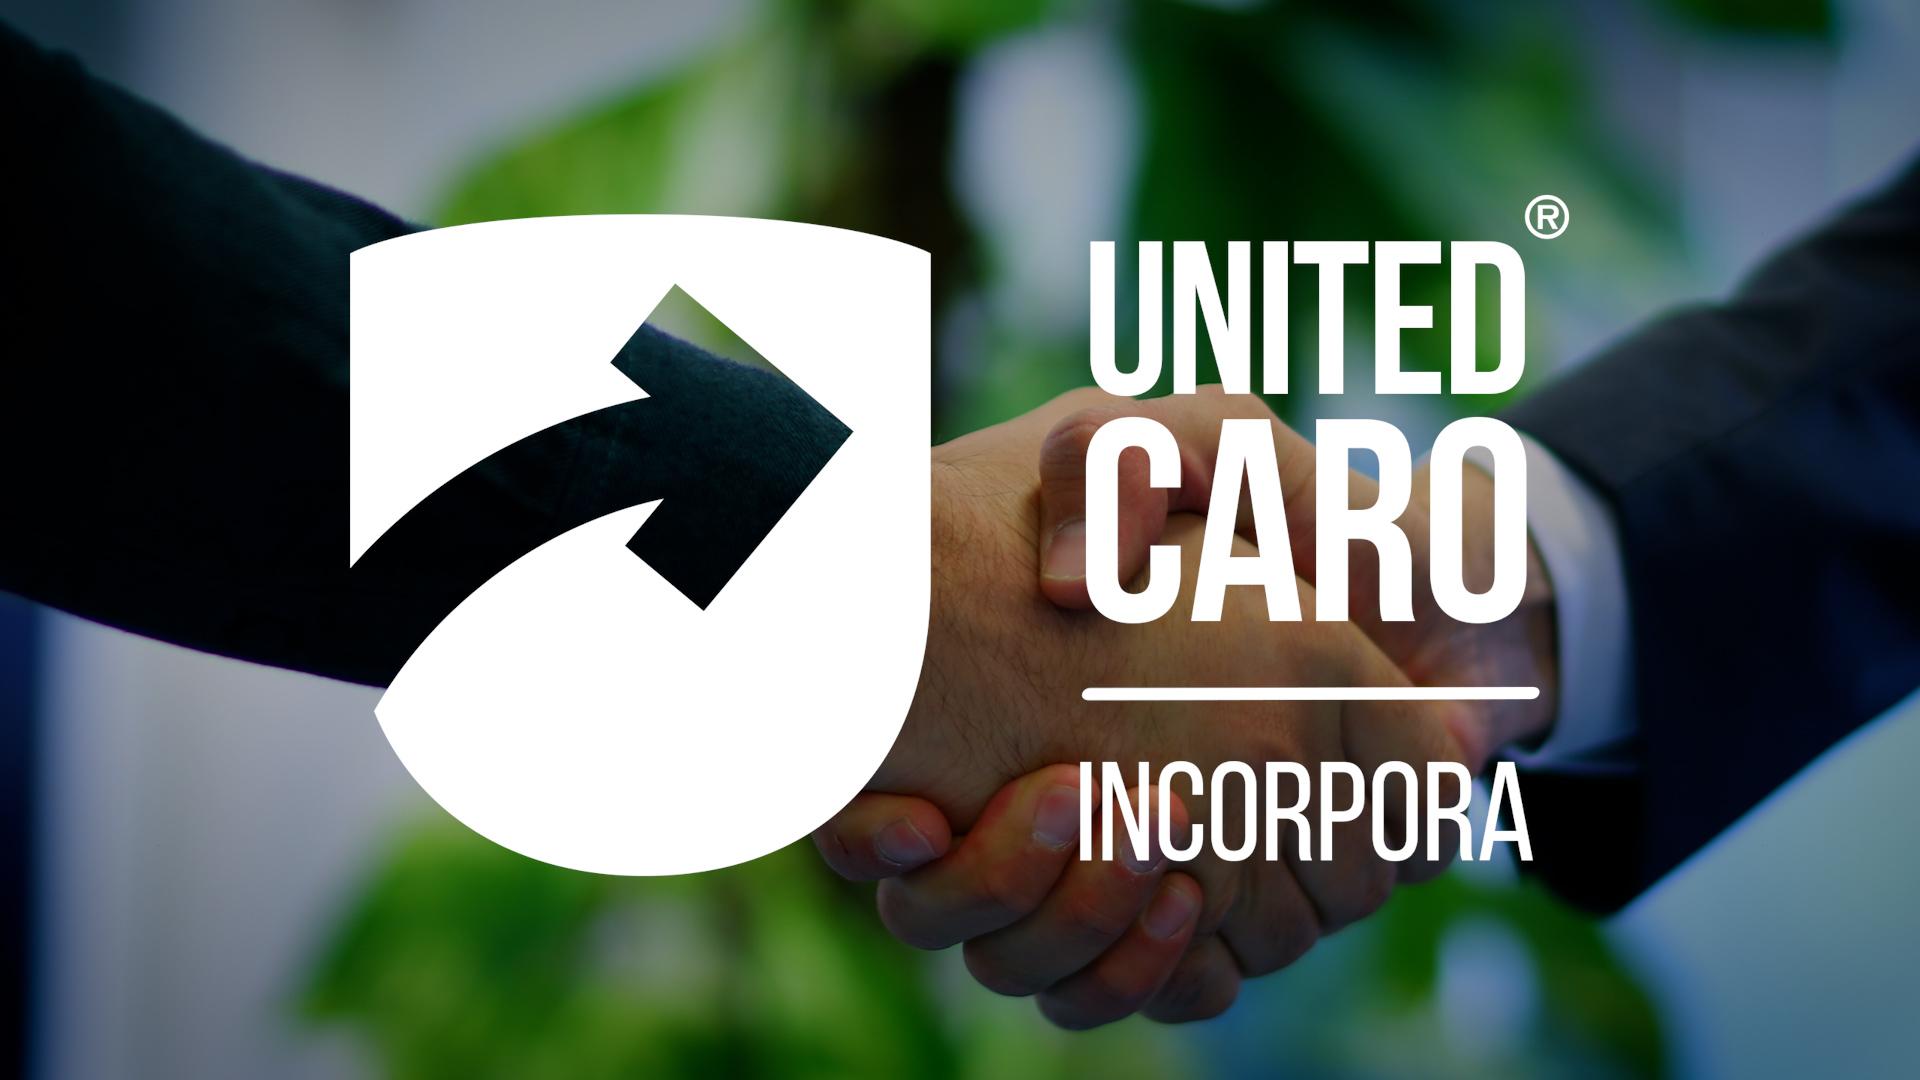 United Caro Incorpora